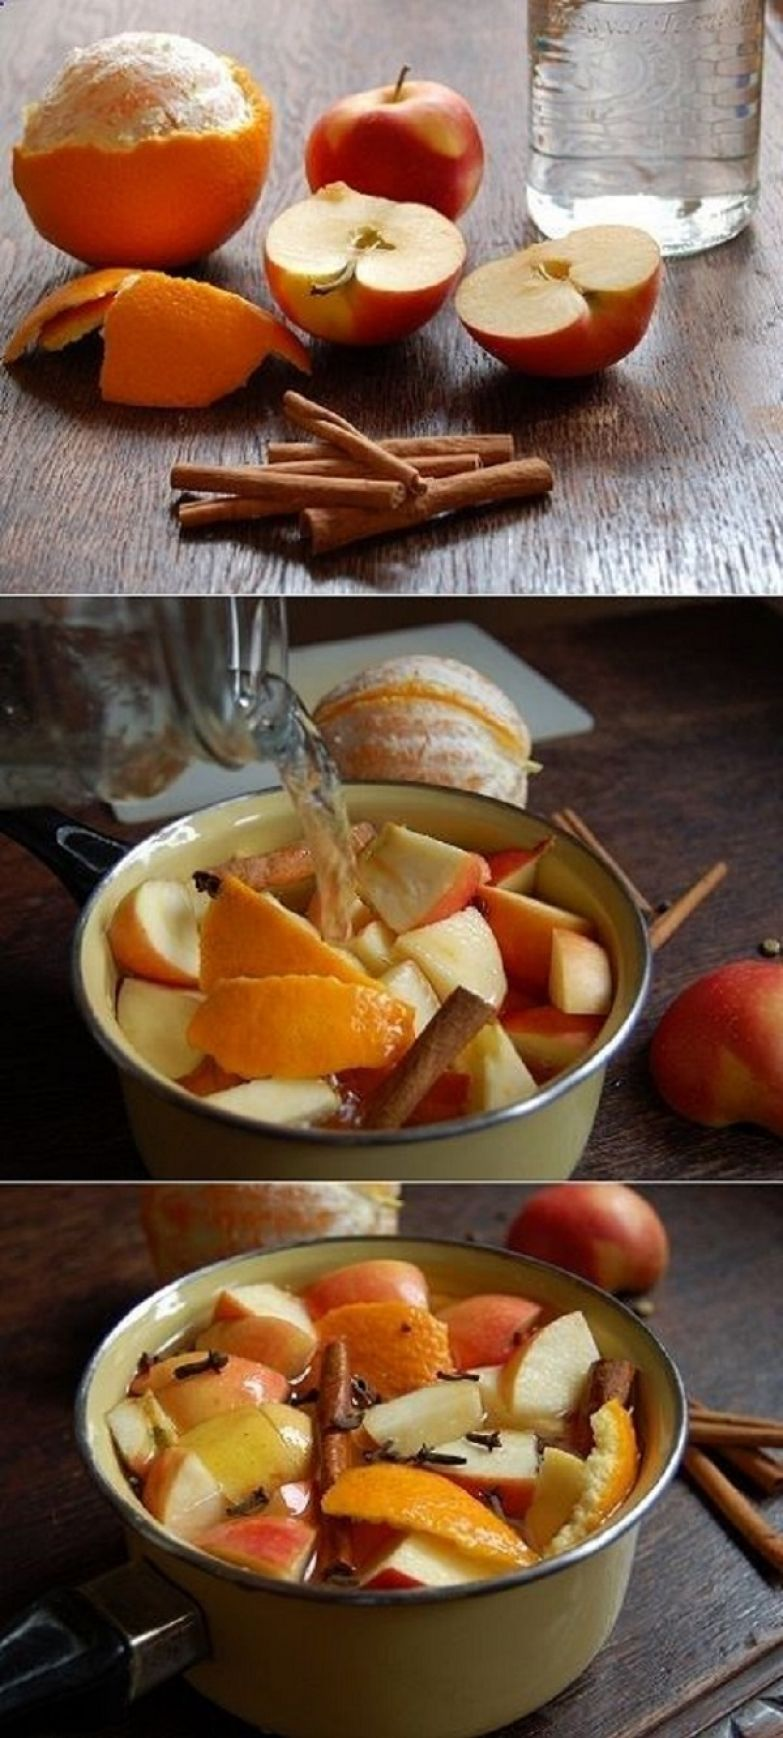 кожура мандарина фото